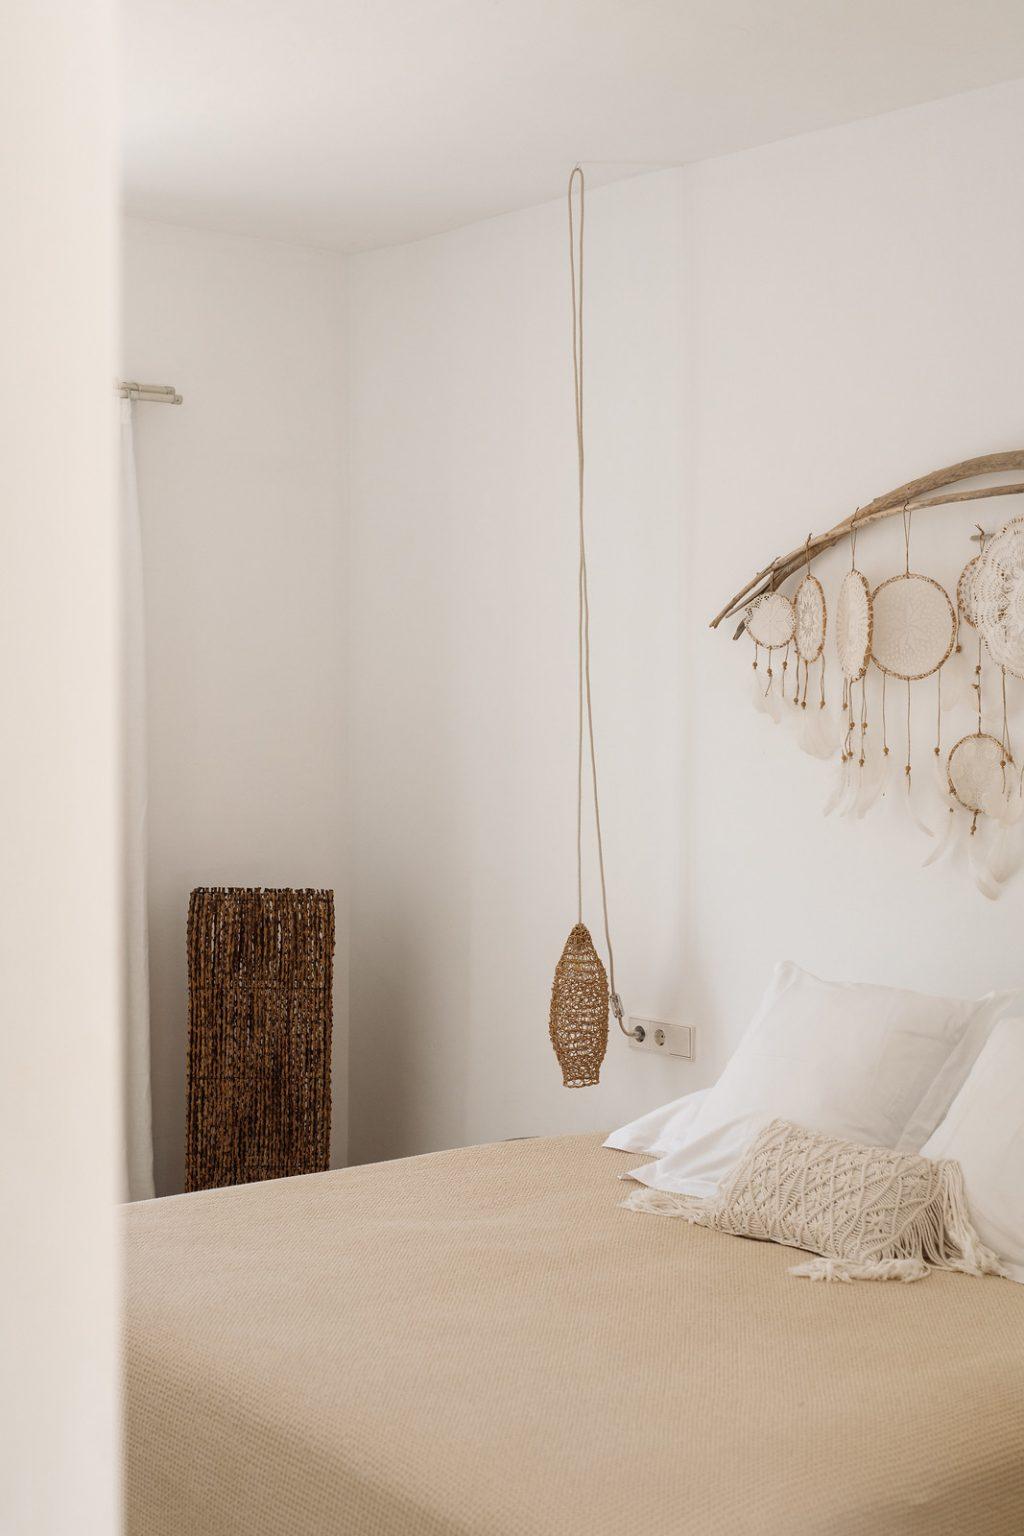 https://www.white-ibiza.com/wp-content/uploads/2020/03/ibiza-hotels-pure-house-ibiza-ana-lui-2021-12-1024x1536.jpg